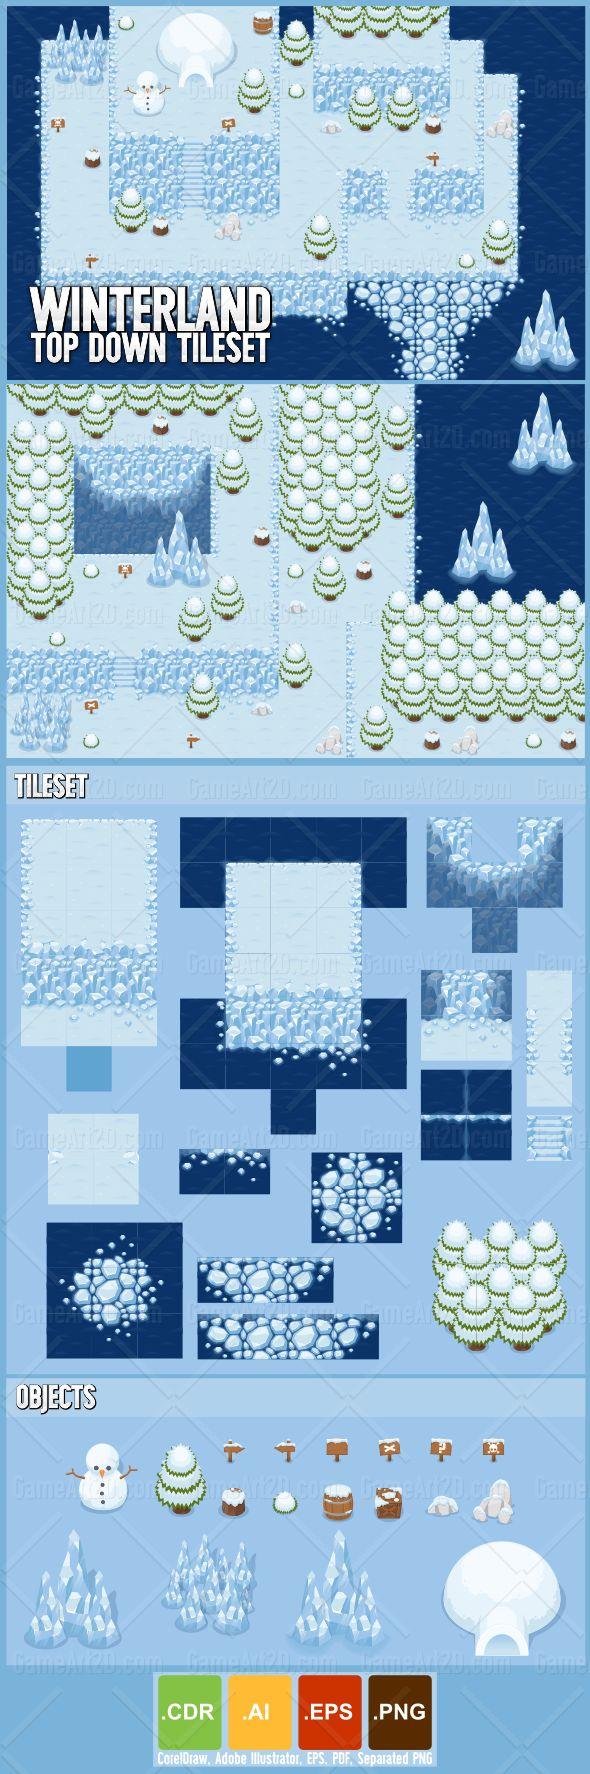 Building Maker Tumblr : Best images about game tileset on pinterest rpg